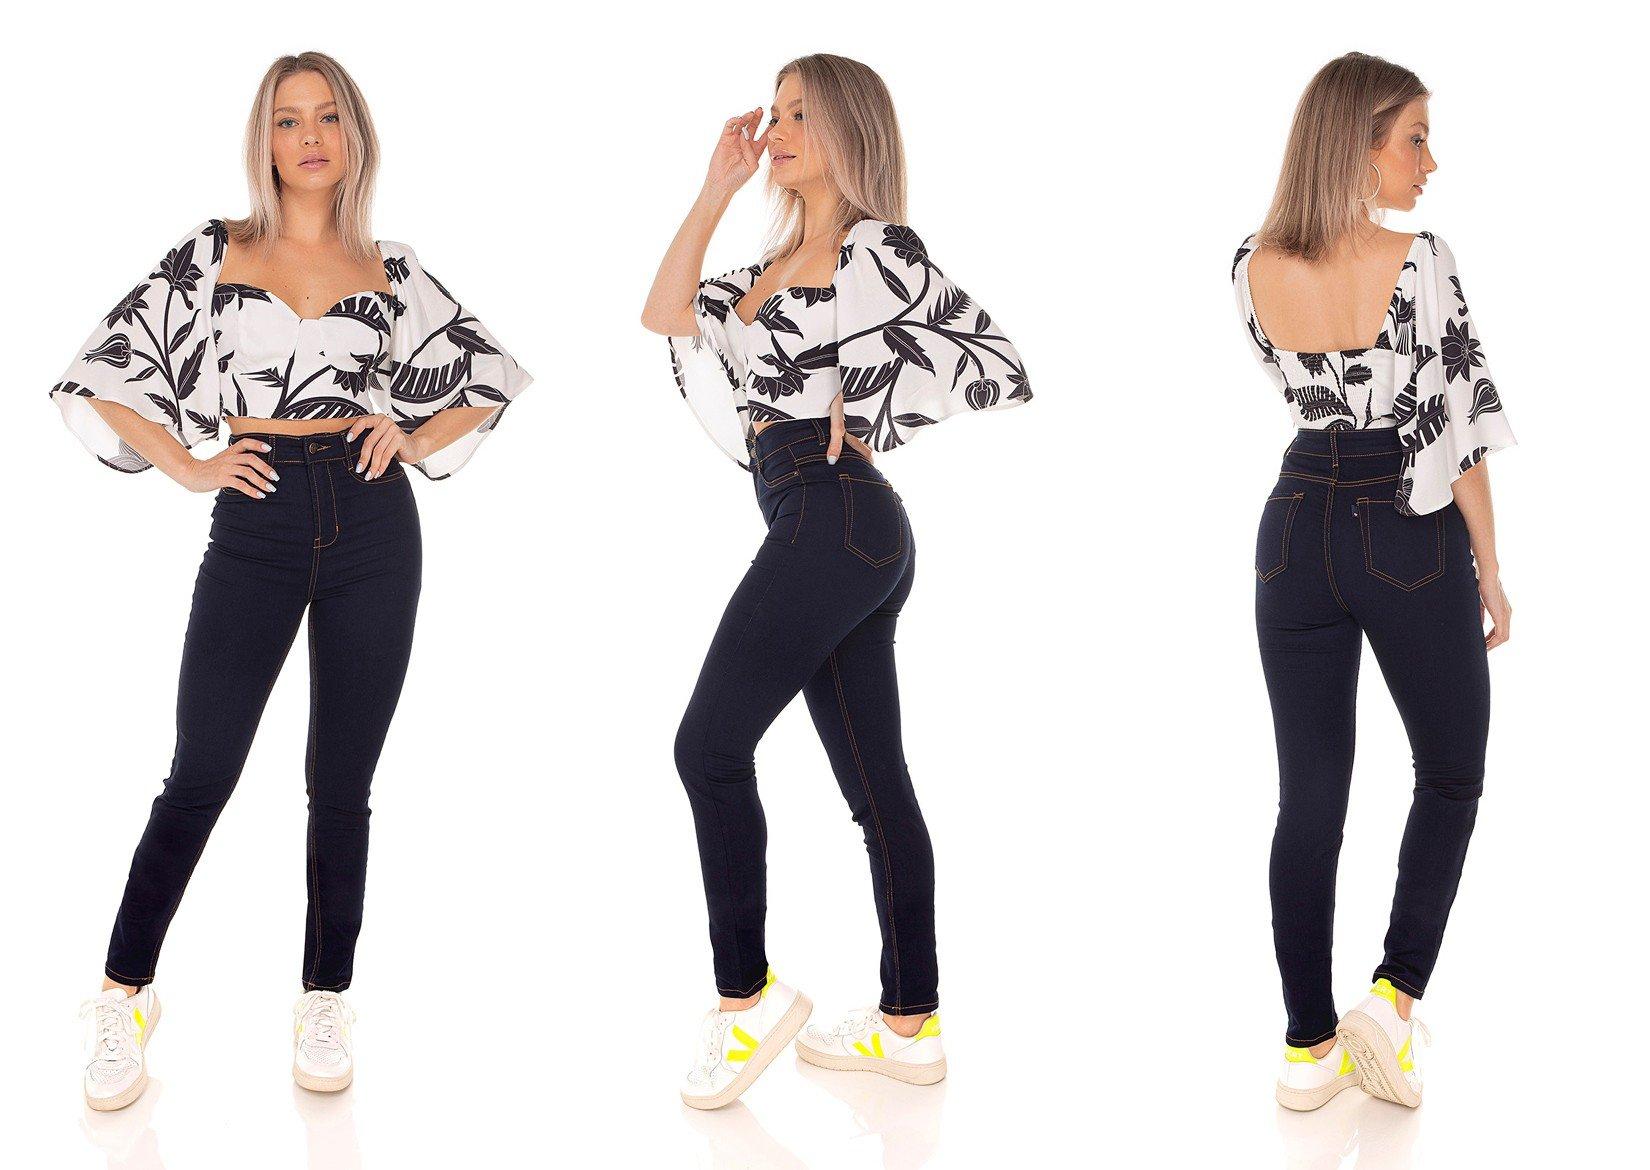 dz3615 calca jeans feminina skinny hot pants tradicional denim zero tripla